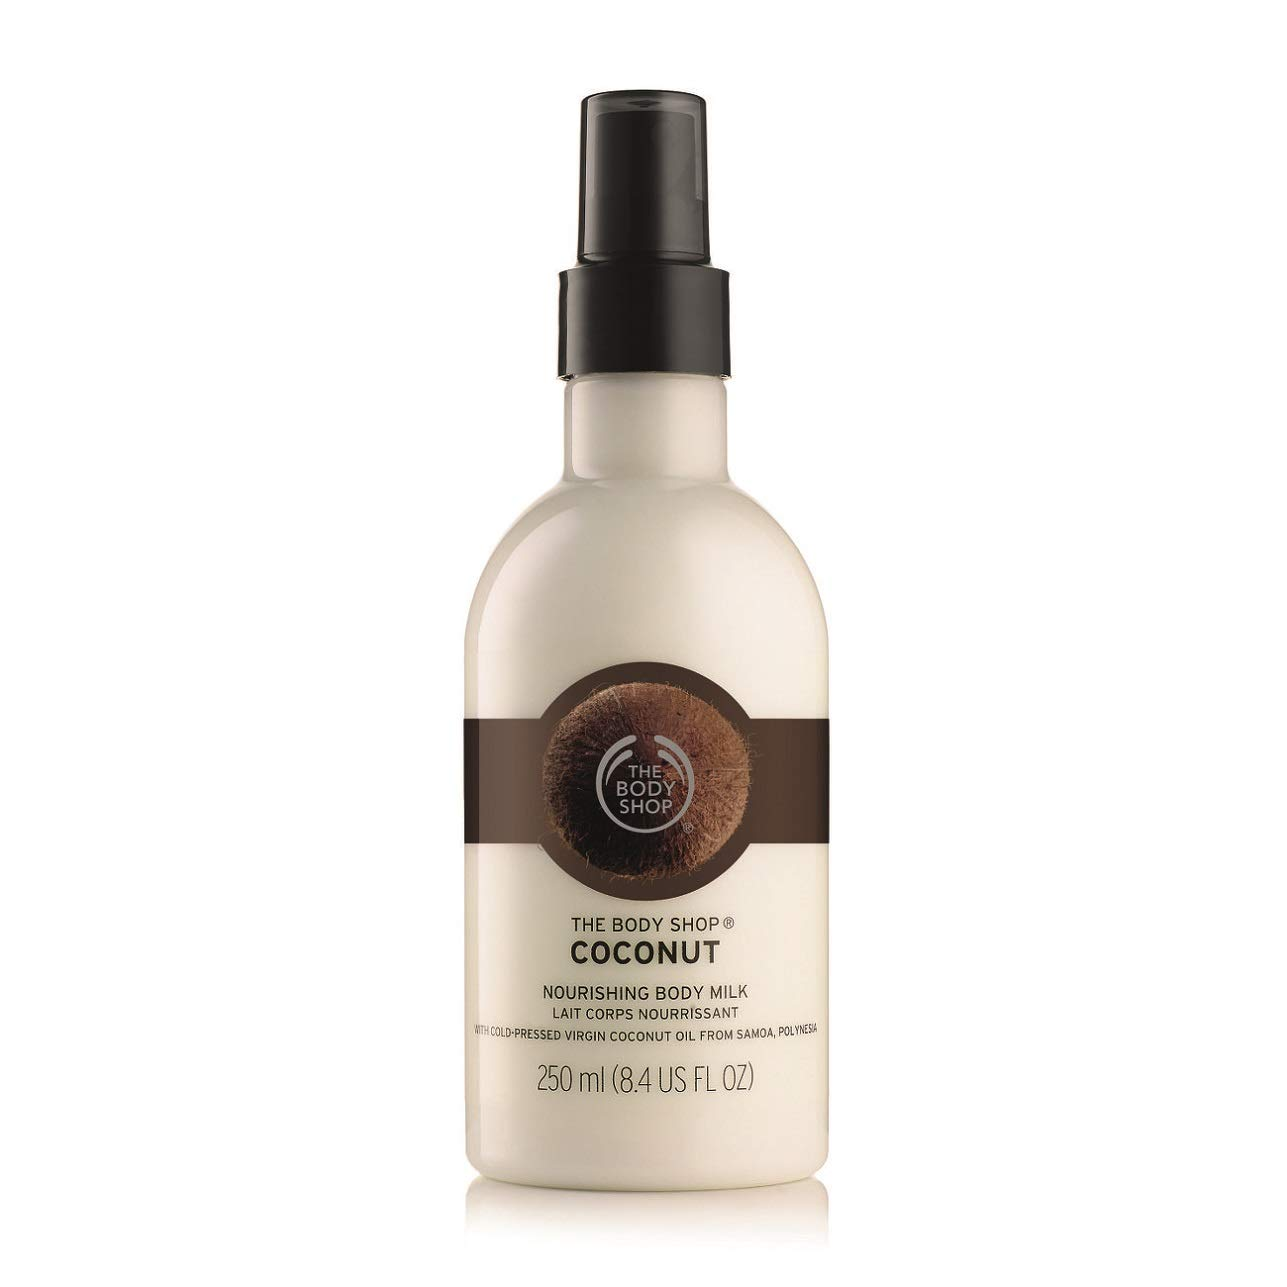 The Body Shop Coconut Nourishing Body Milk, Paraben-Free Body Lotion, 8.4 Fl. Oz. by The Body Shop